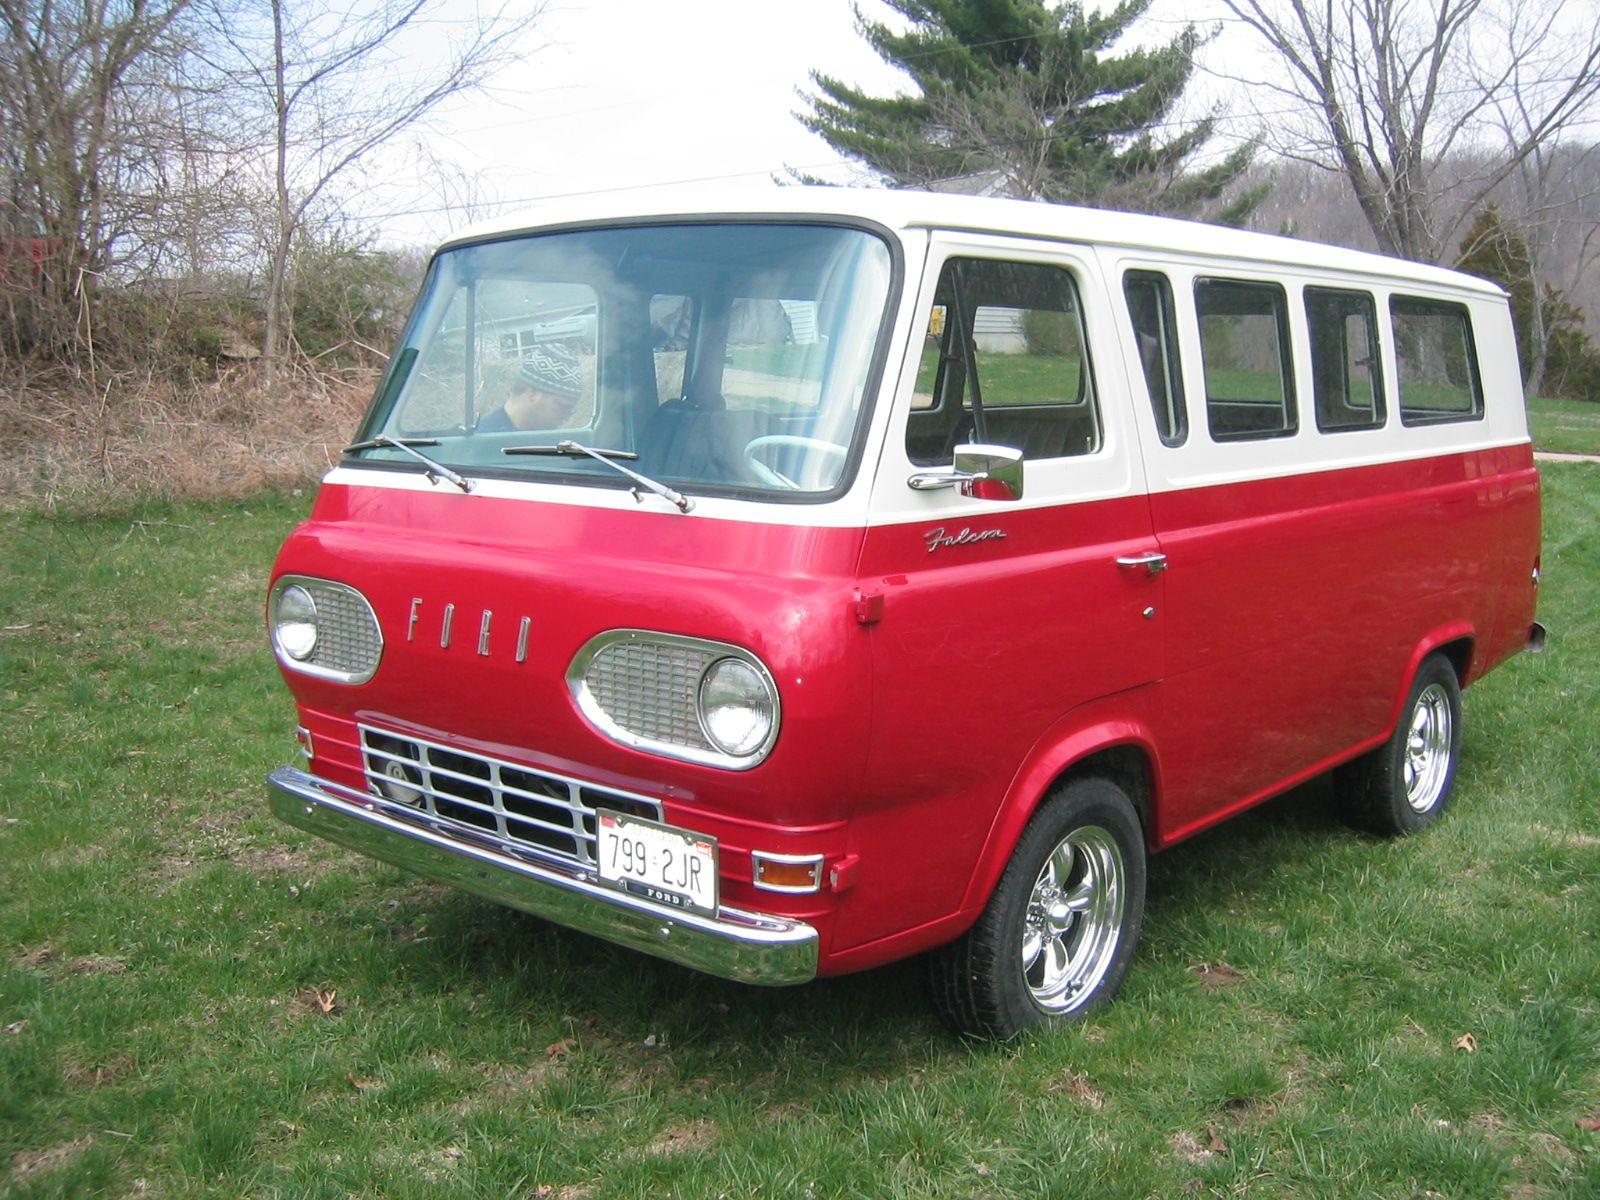 1967 ford falcon van cool amp strange vehicles pinterest